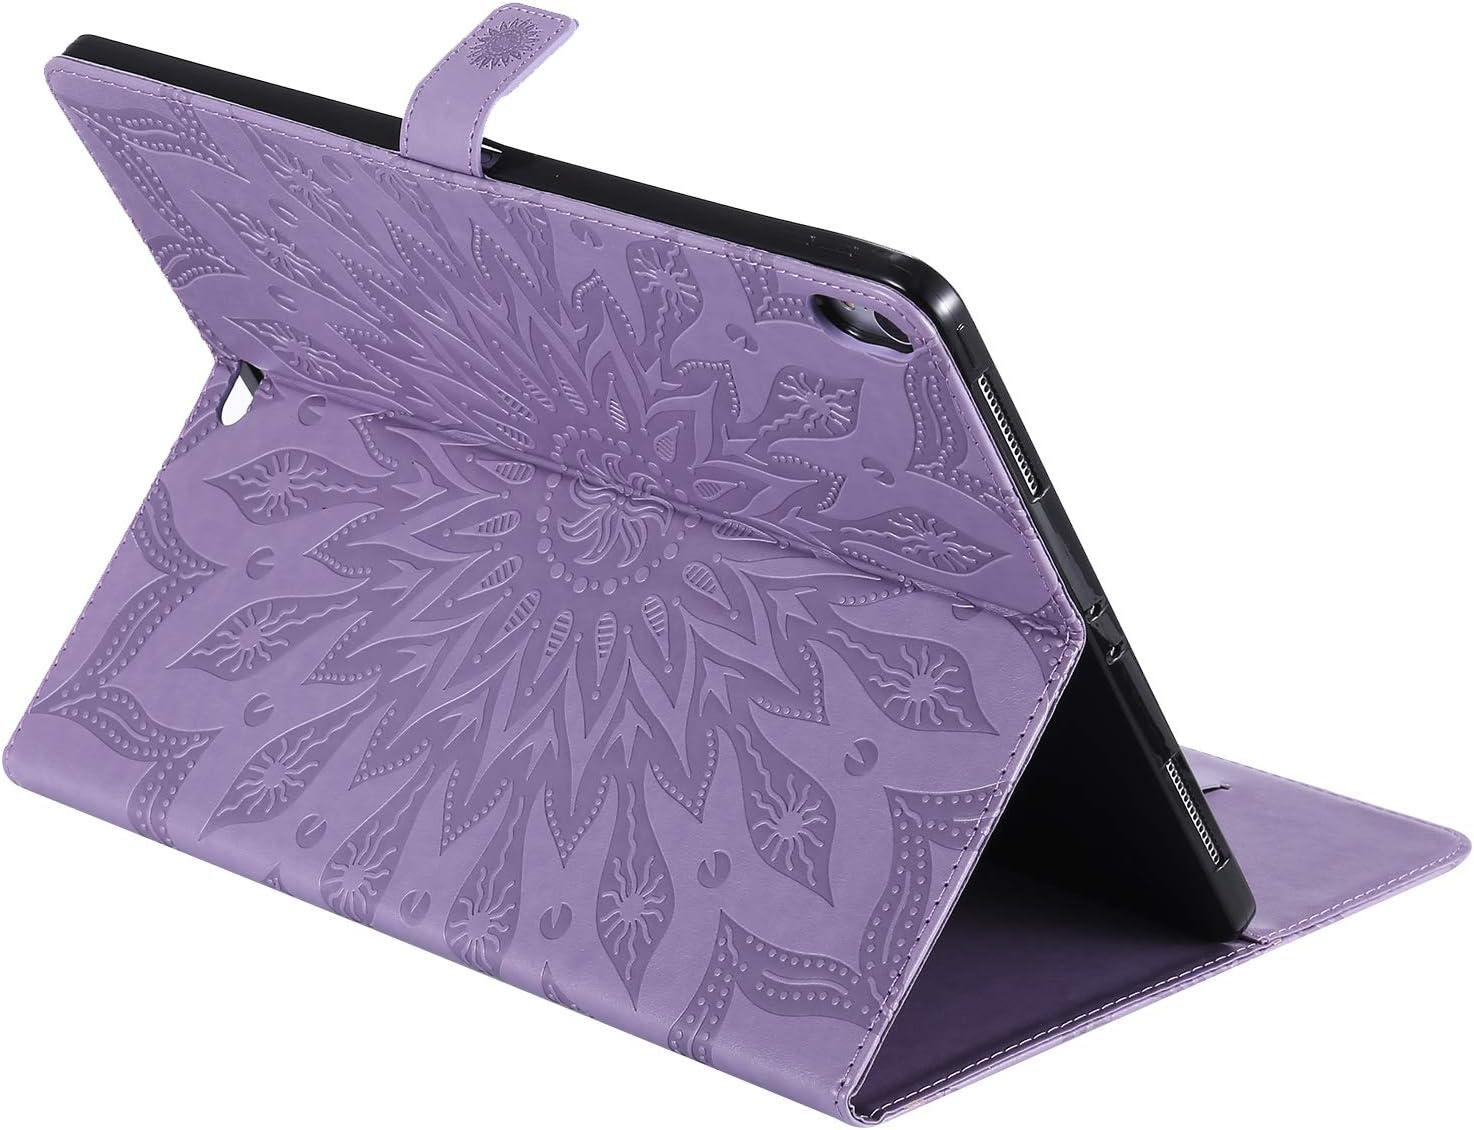 Huphant Kompatibel Mit iPad Pro 12.9 2018 Veision 2018 Veision Schutzh/ülle Flip Case 360 /° Protective Brieftasche h/ülle iPad Pro 12.9 Handyh/ülle Embossed Blume Kartenf/ächer -Grau